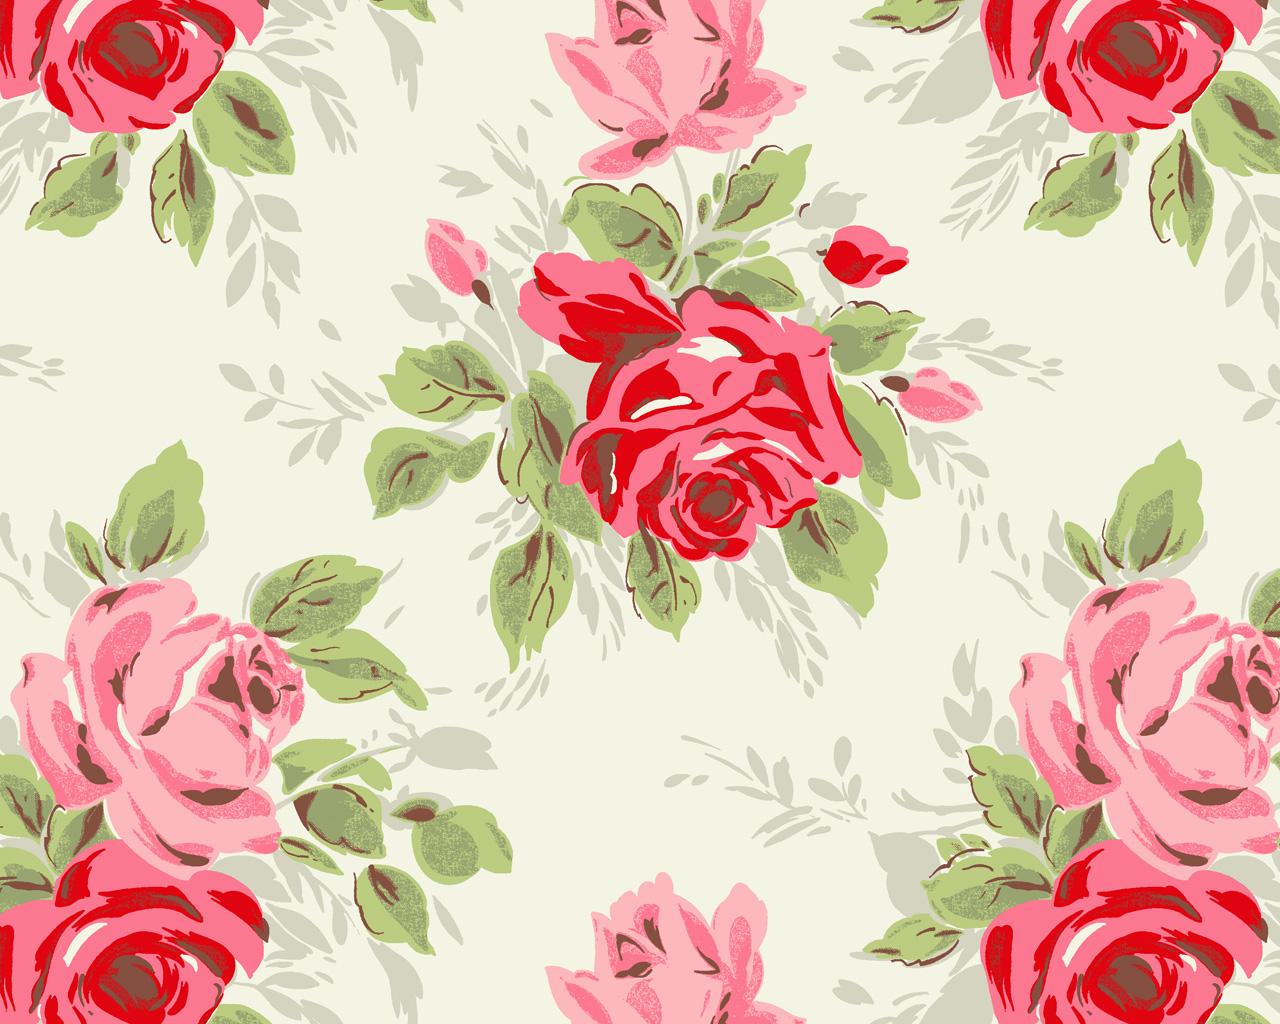 Free Download Floral Print Wallpaper Hd Wallpapers Pretty